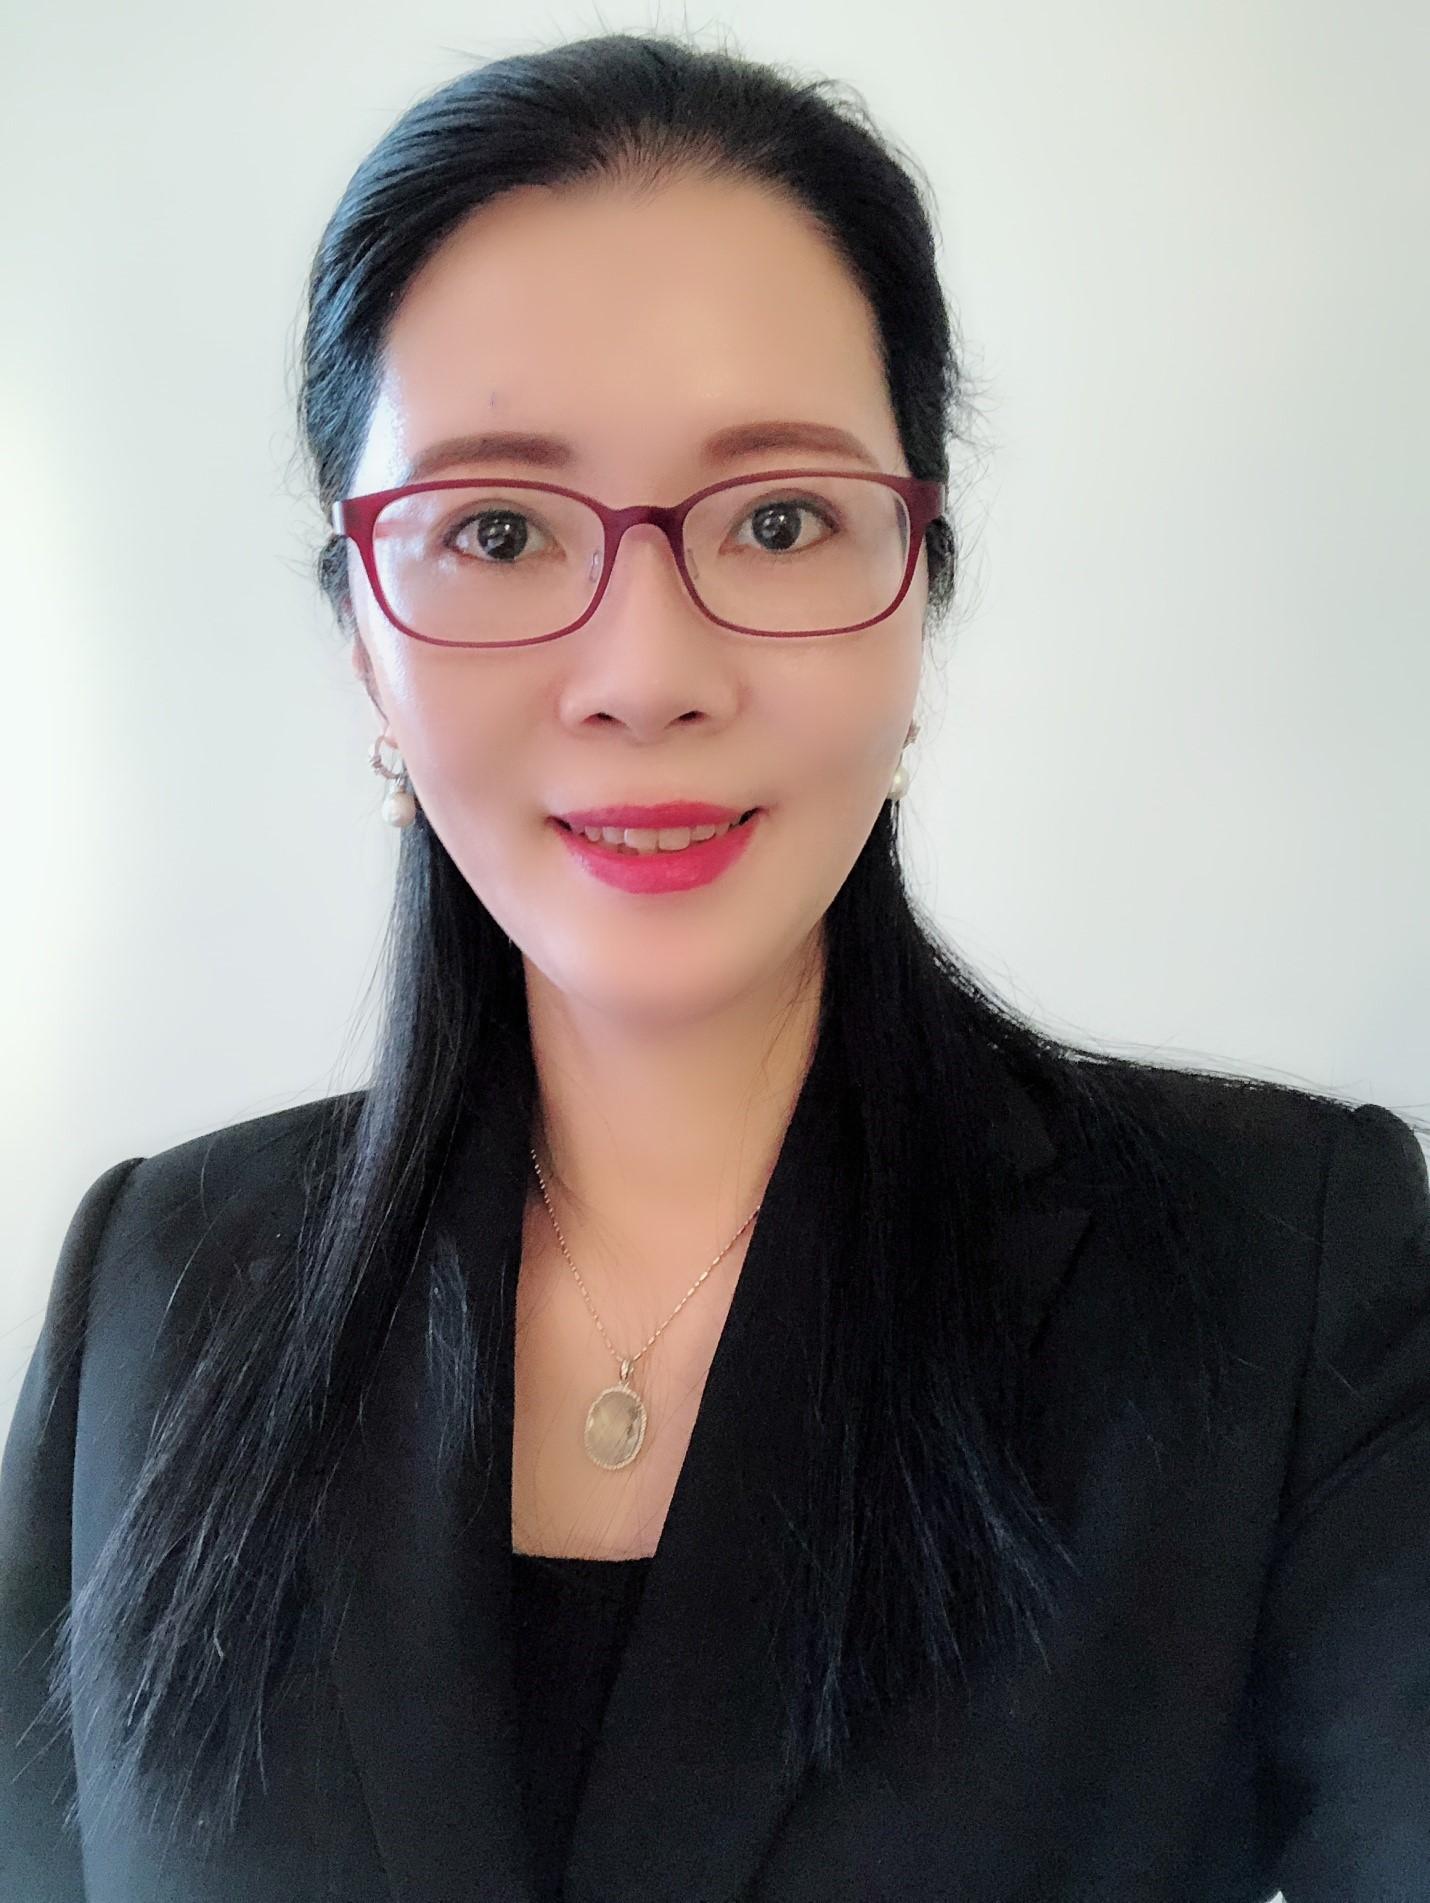 KaiHong Qiu